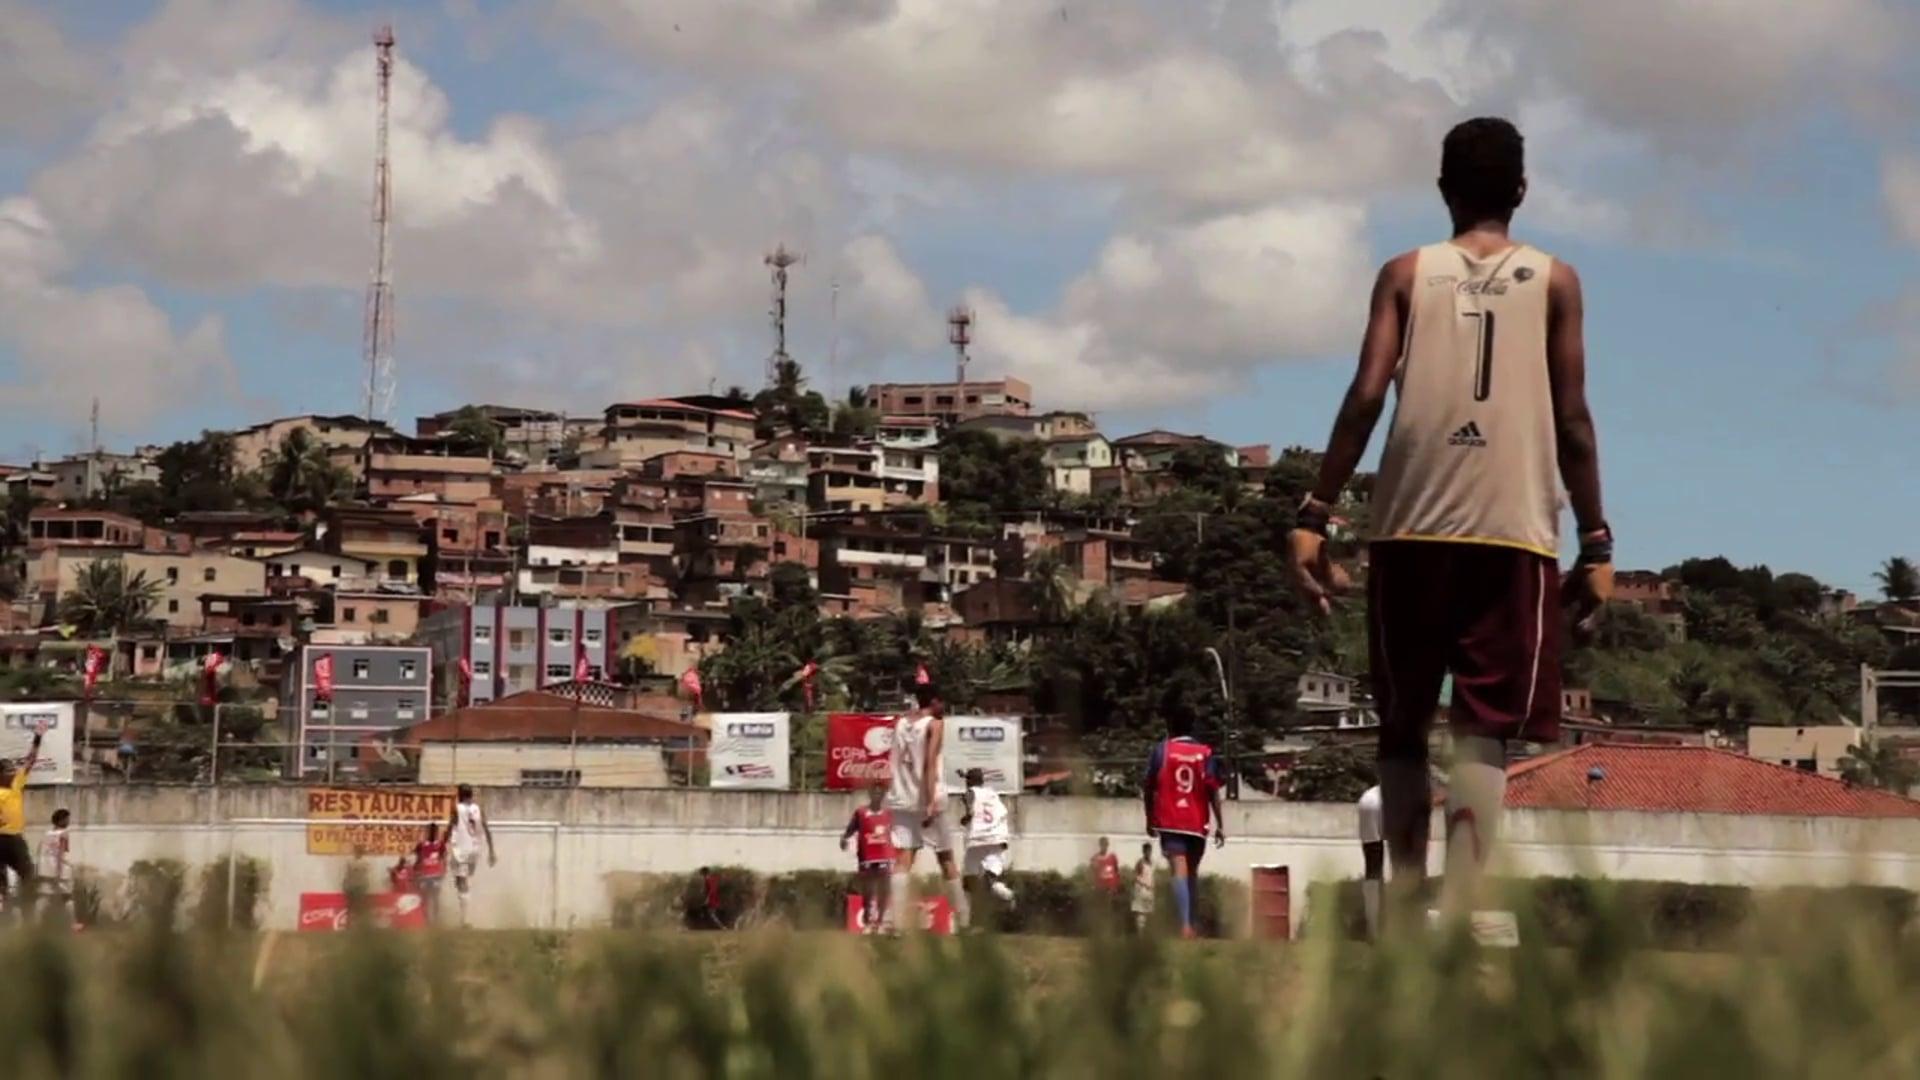 Copa Coca-Cola   Futebol Moleque - Salvador